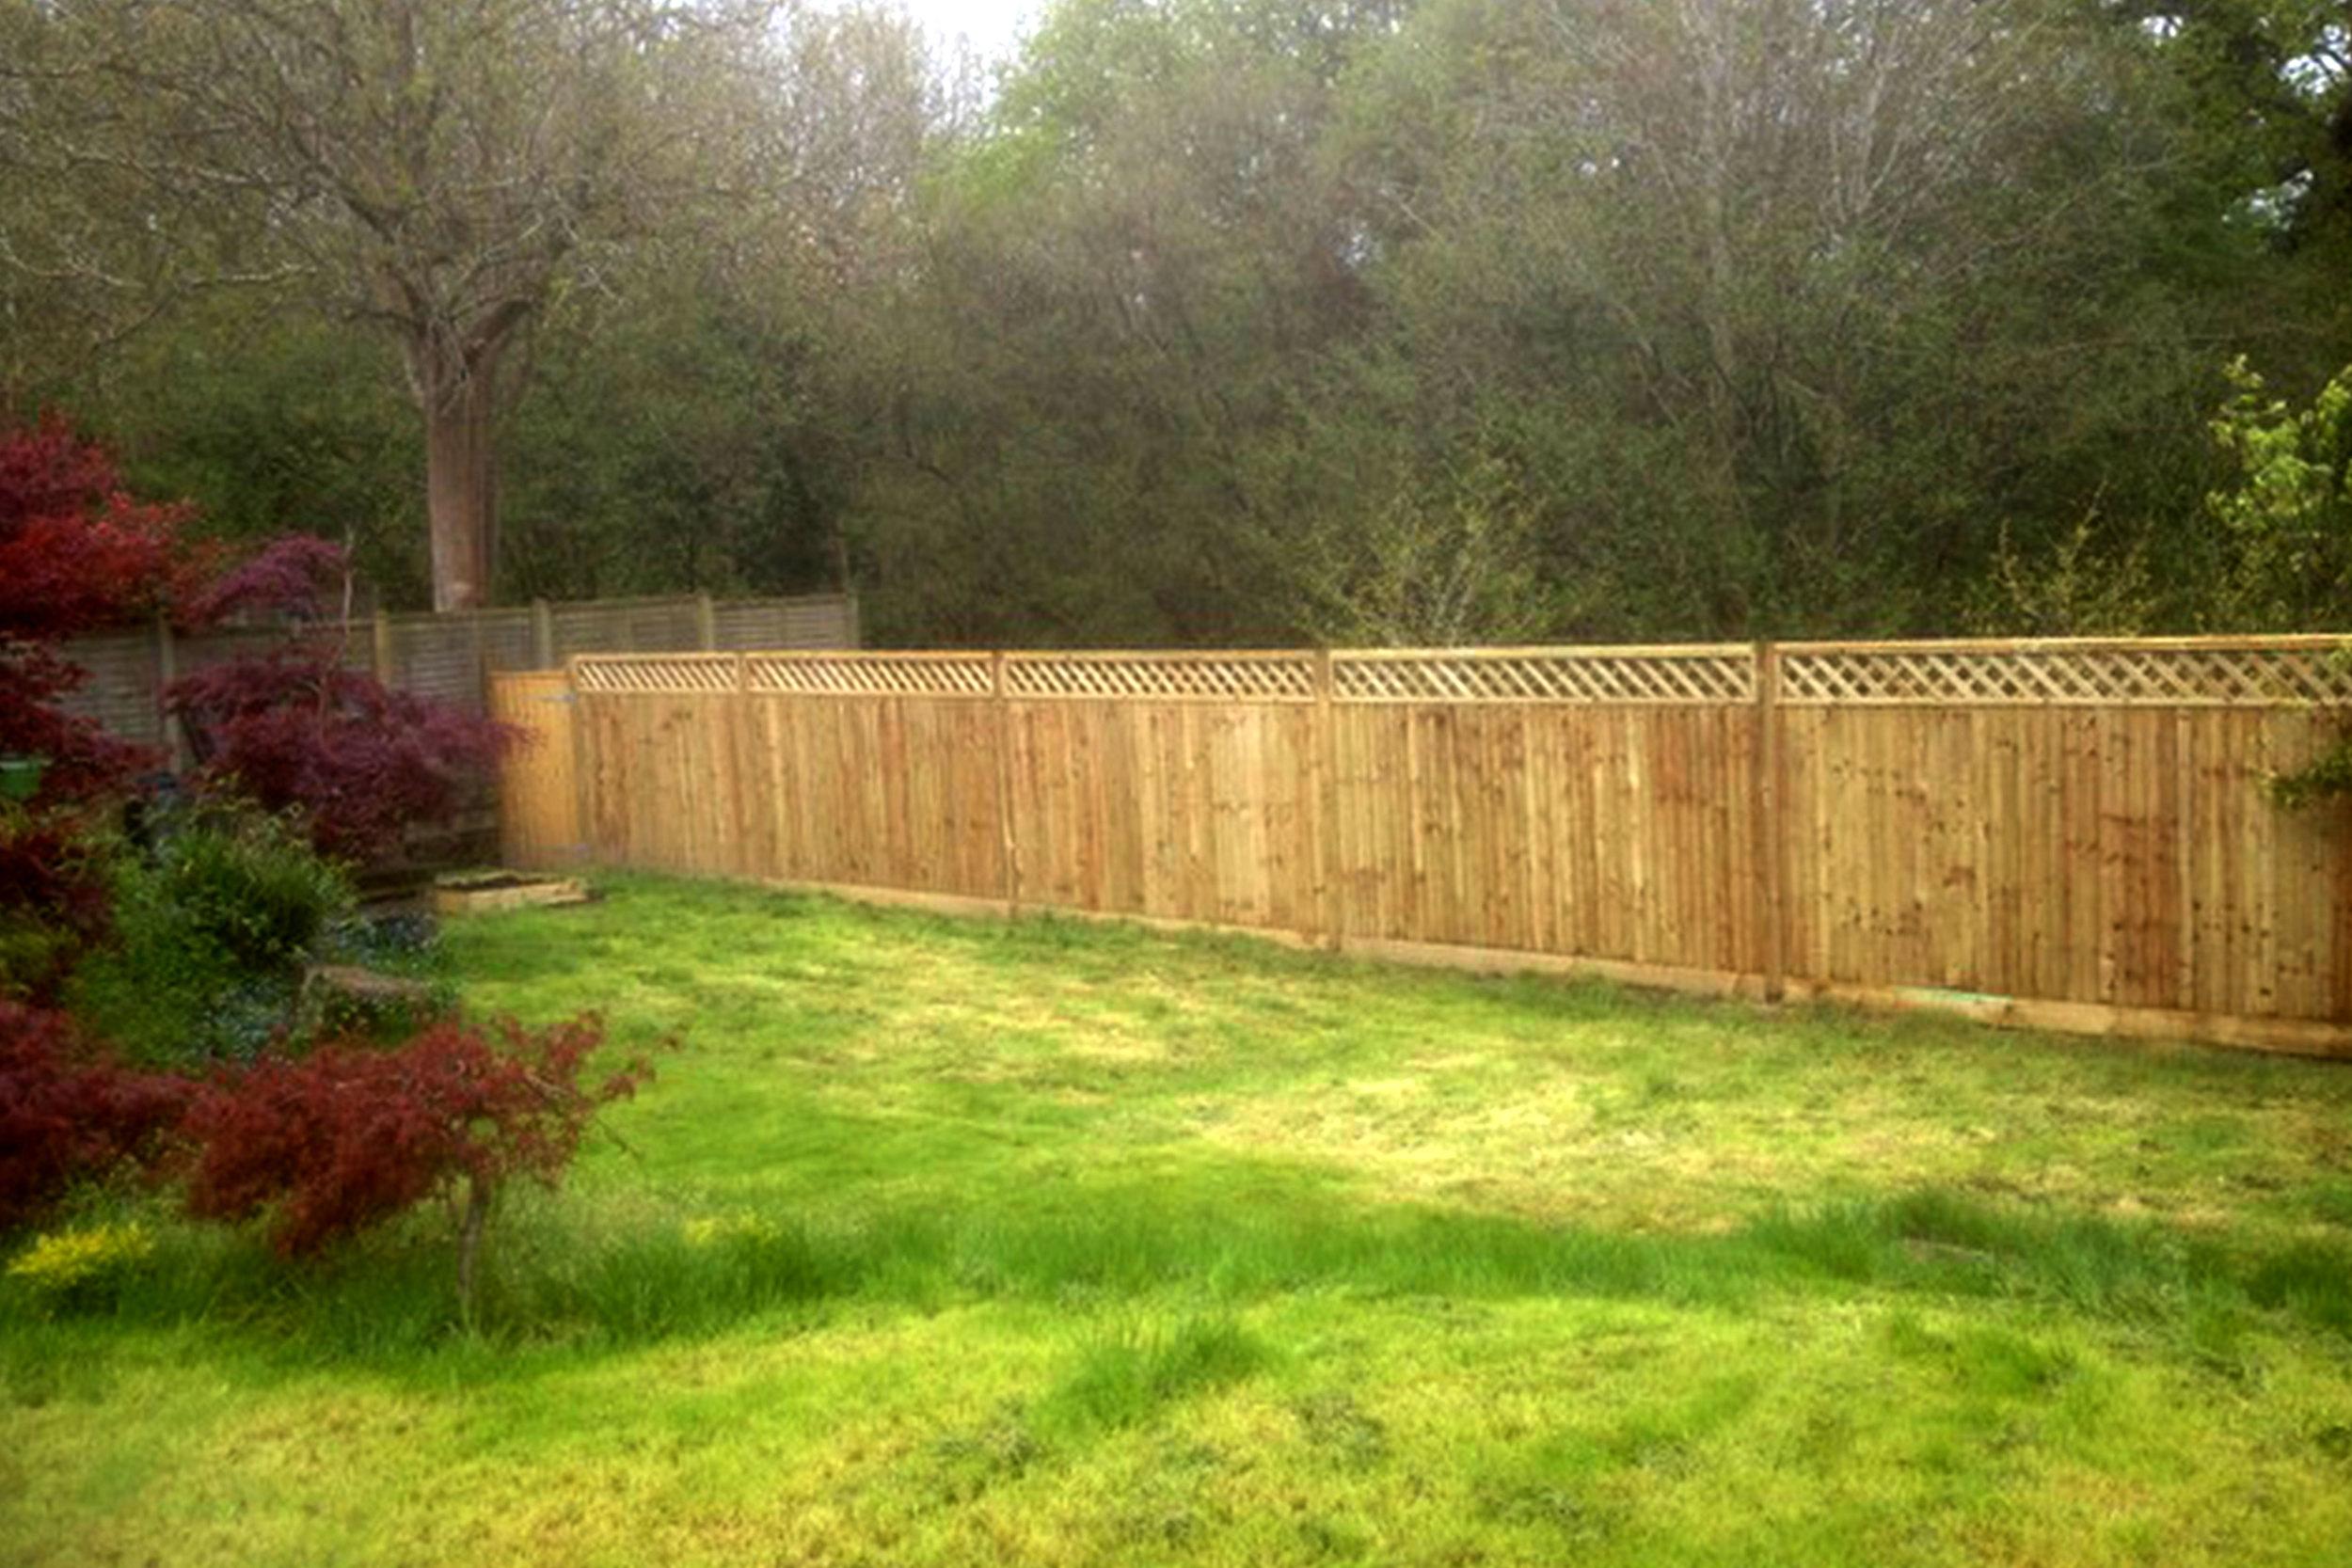 Fence_3.jpg